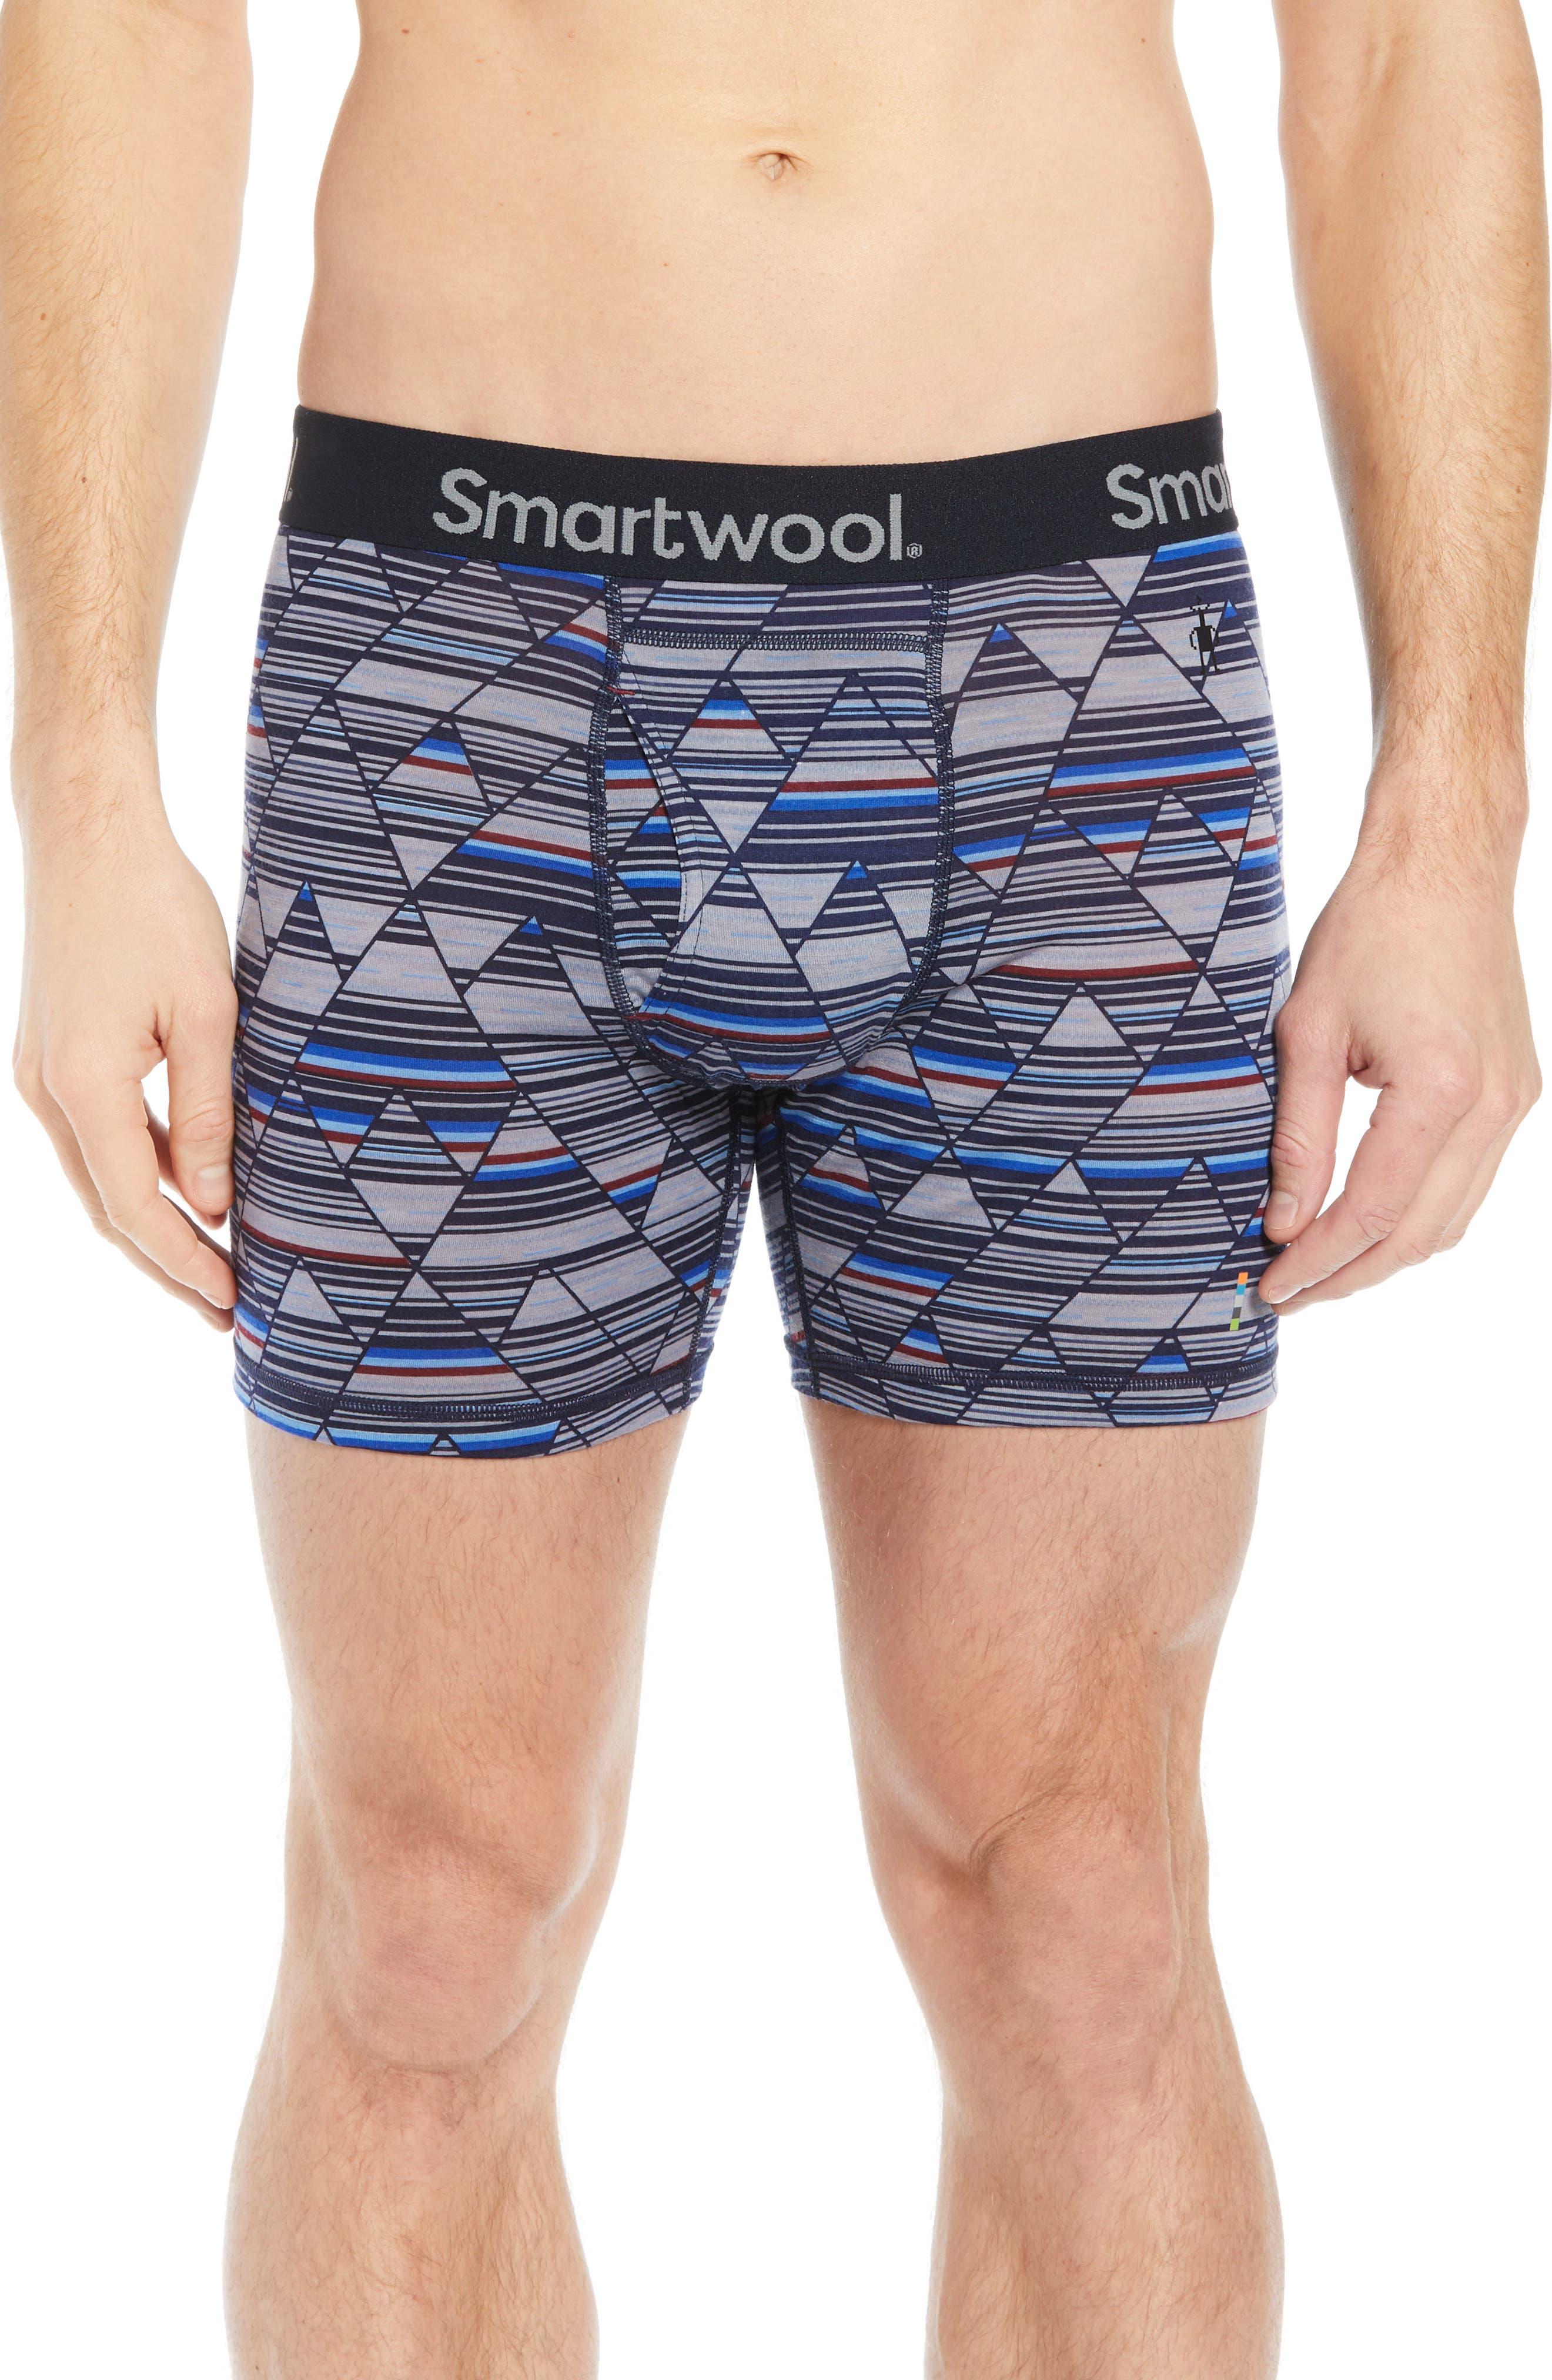 Smartwool Merino 150 Wool Blend Boxer Briefs, Blue